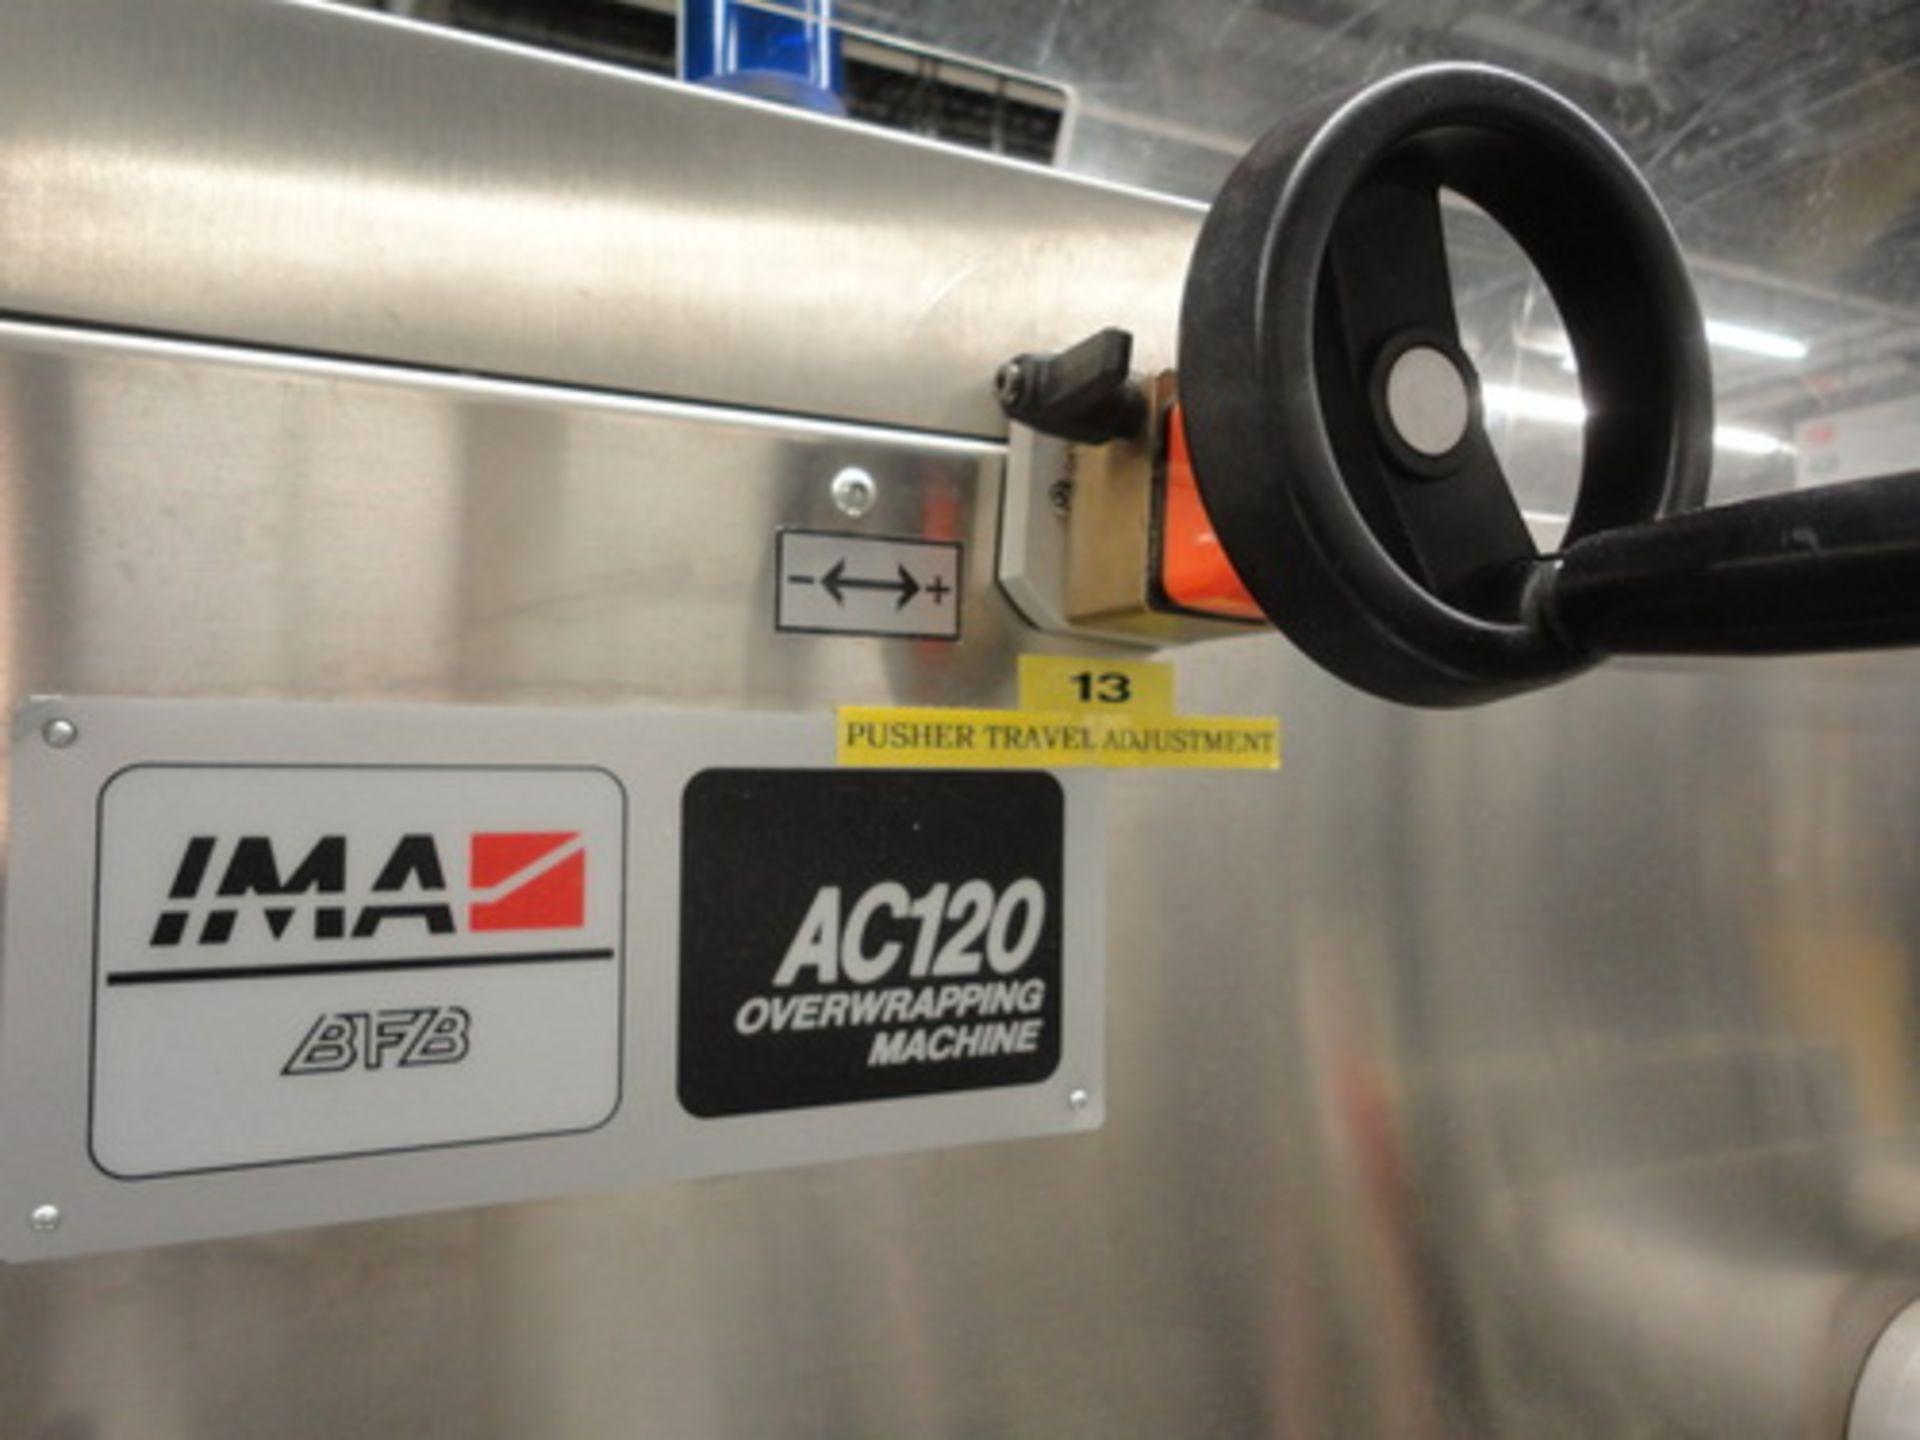 Lot 14 - IMA/BFB Carton Overwrapping Machine, Model AC120, S/N 5149